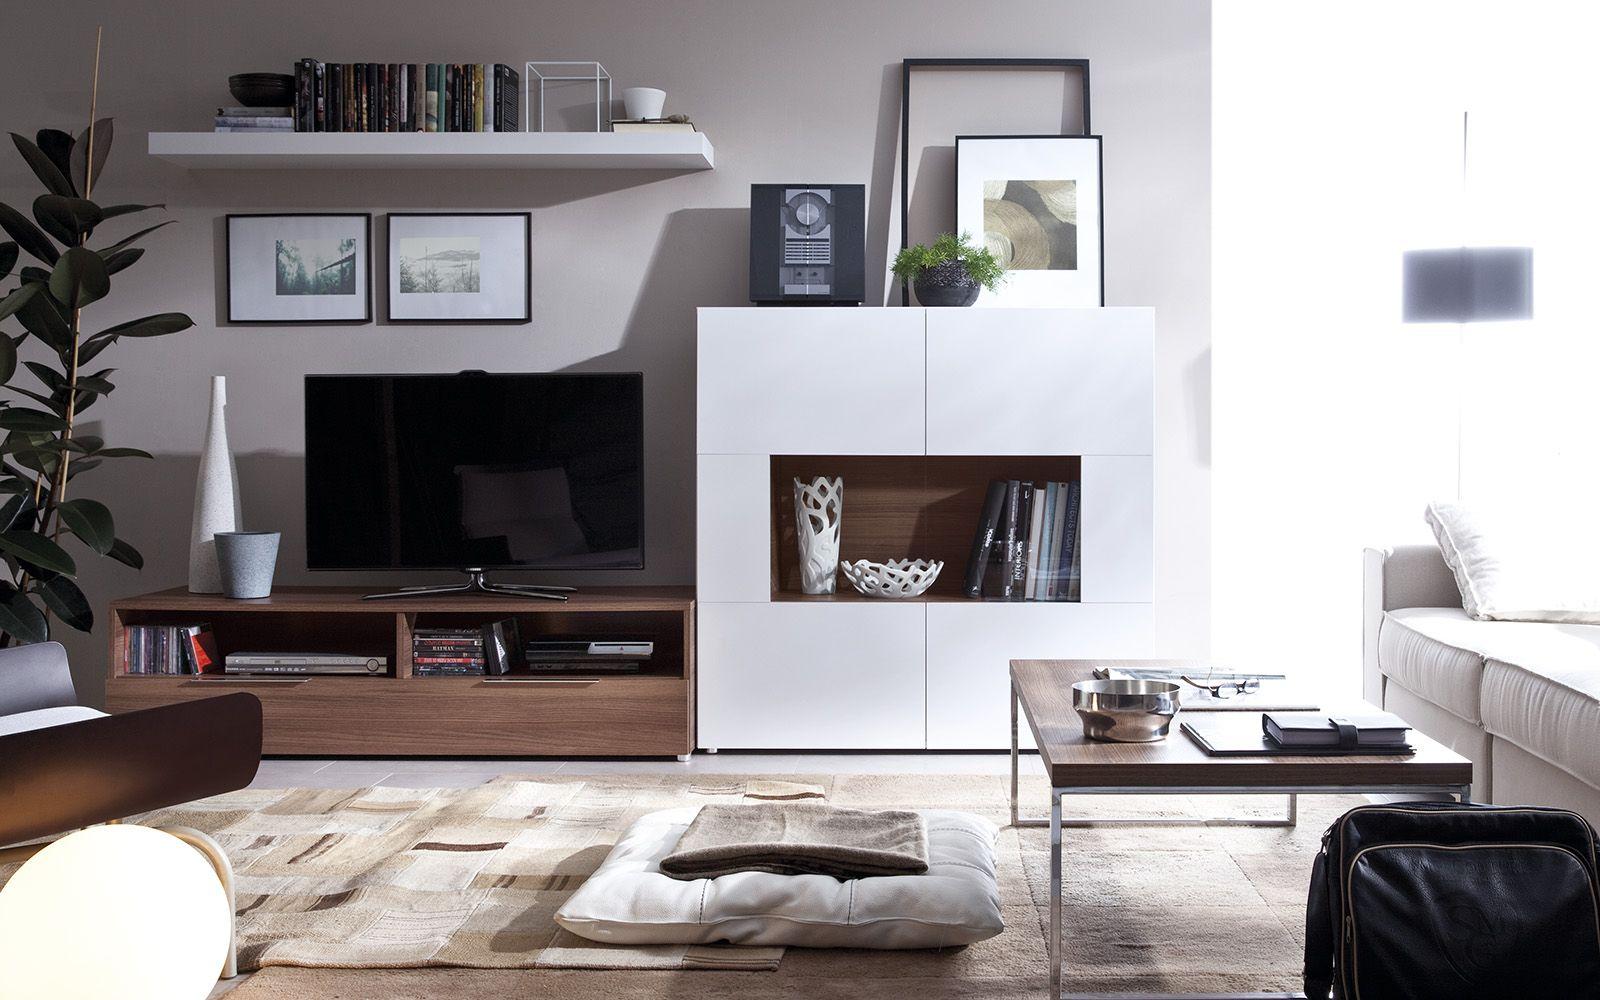 Modern yeni tv unite modelleri 7 - Modern Wall Unit Crea Cr03 By Rimobel Furniture Spain Wallunit Livingroom Furniture